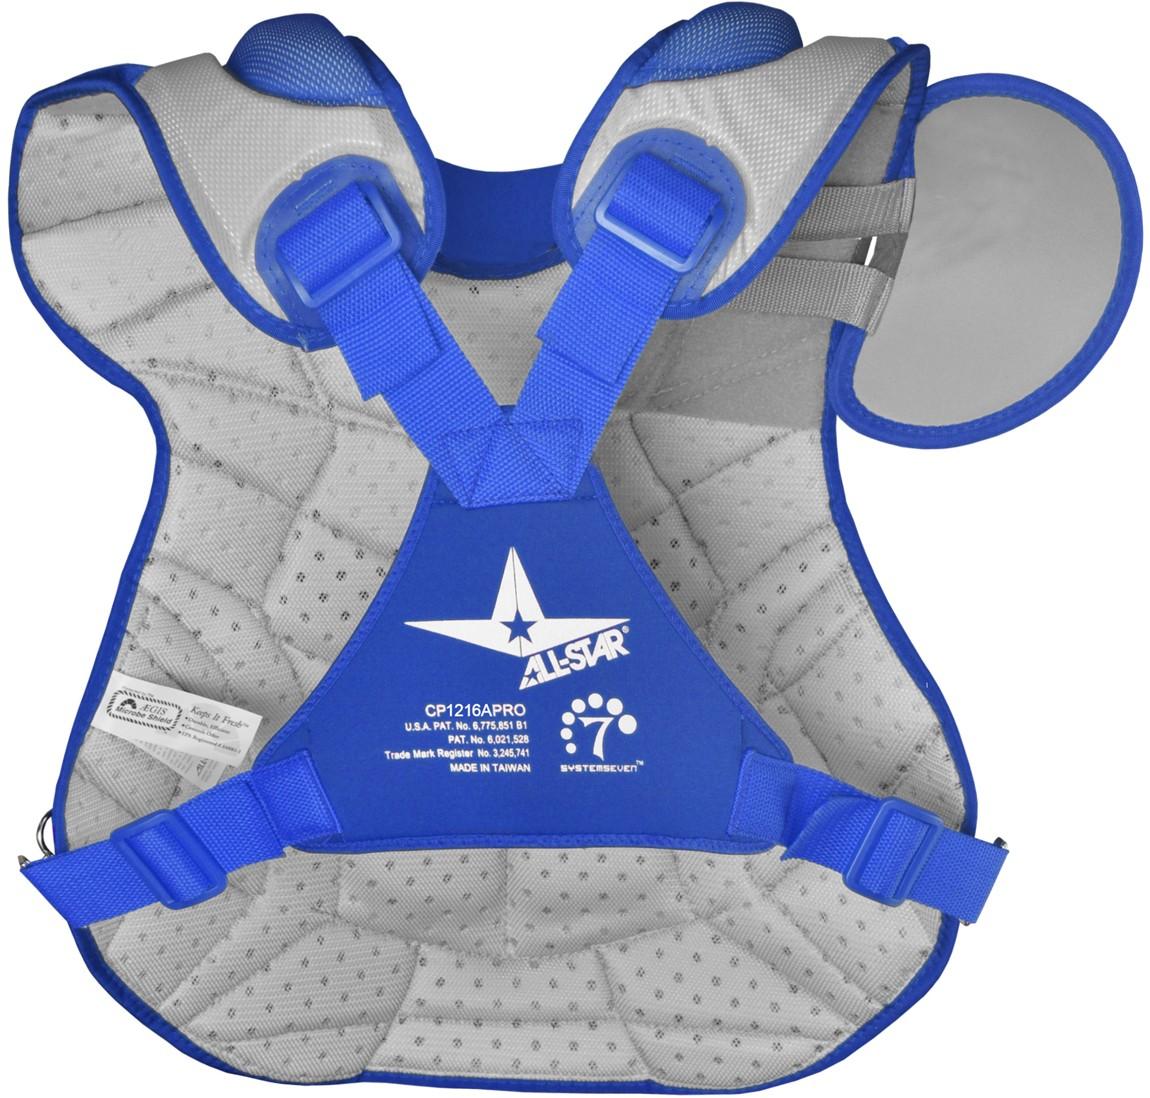 DeltaFlex harness